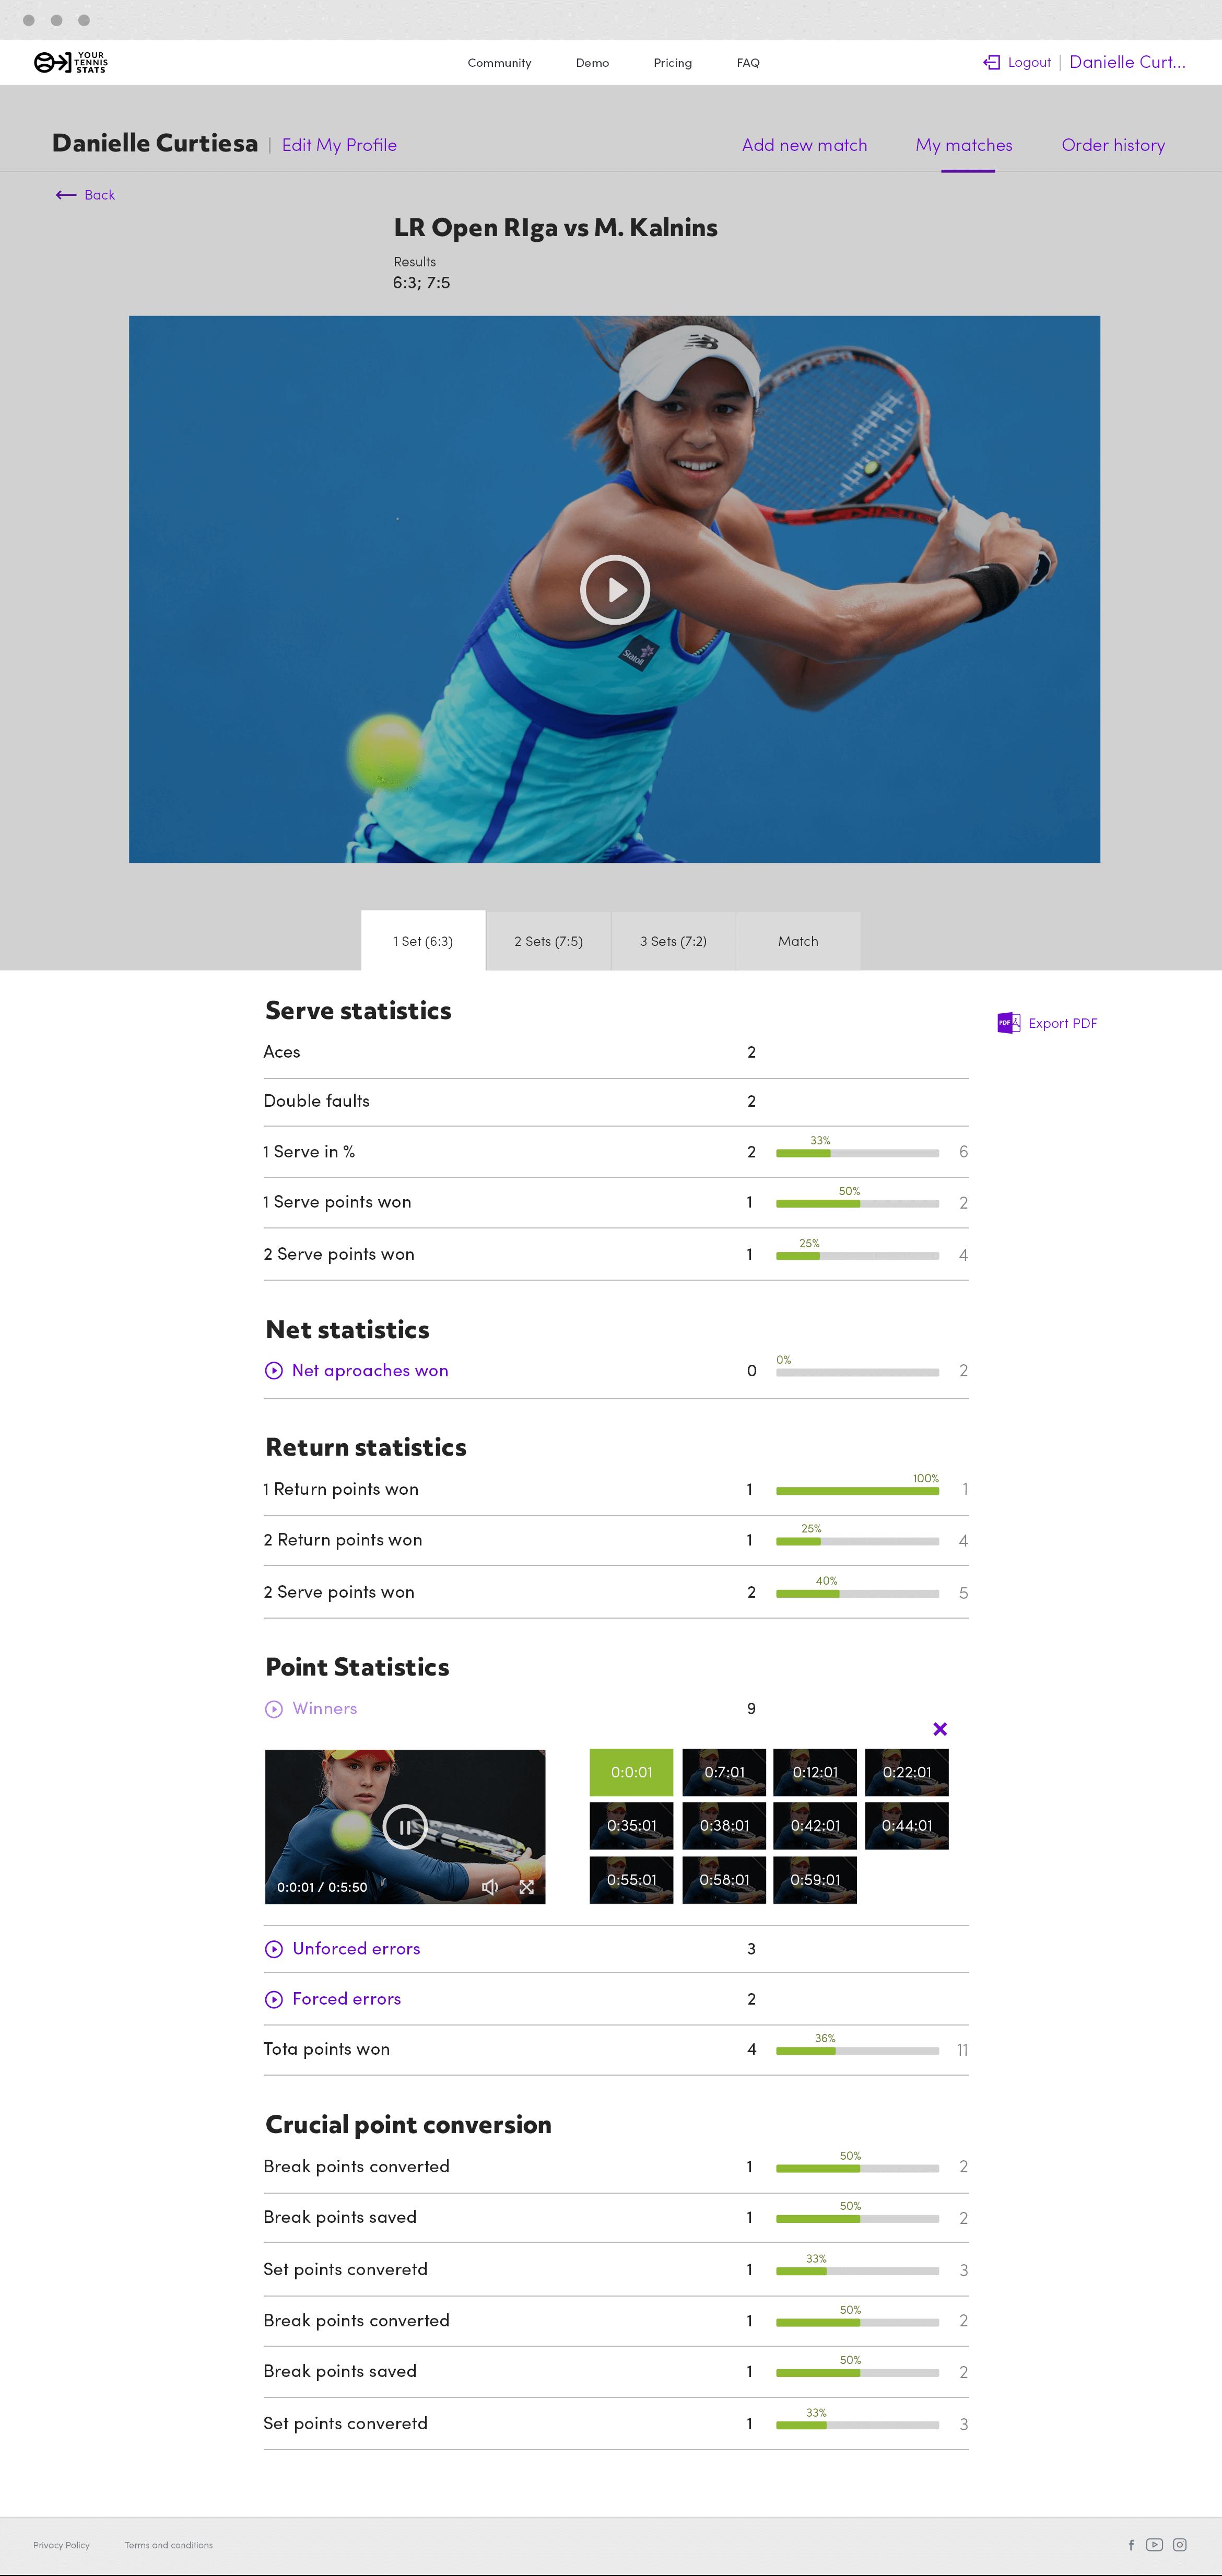 my-matches_11 (1)